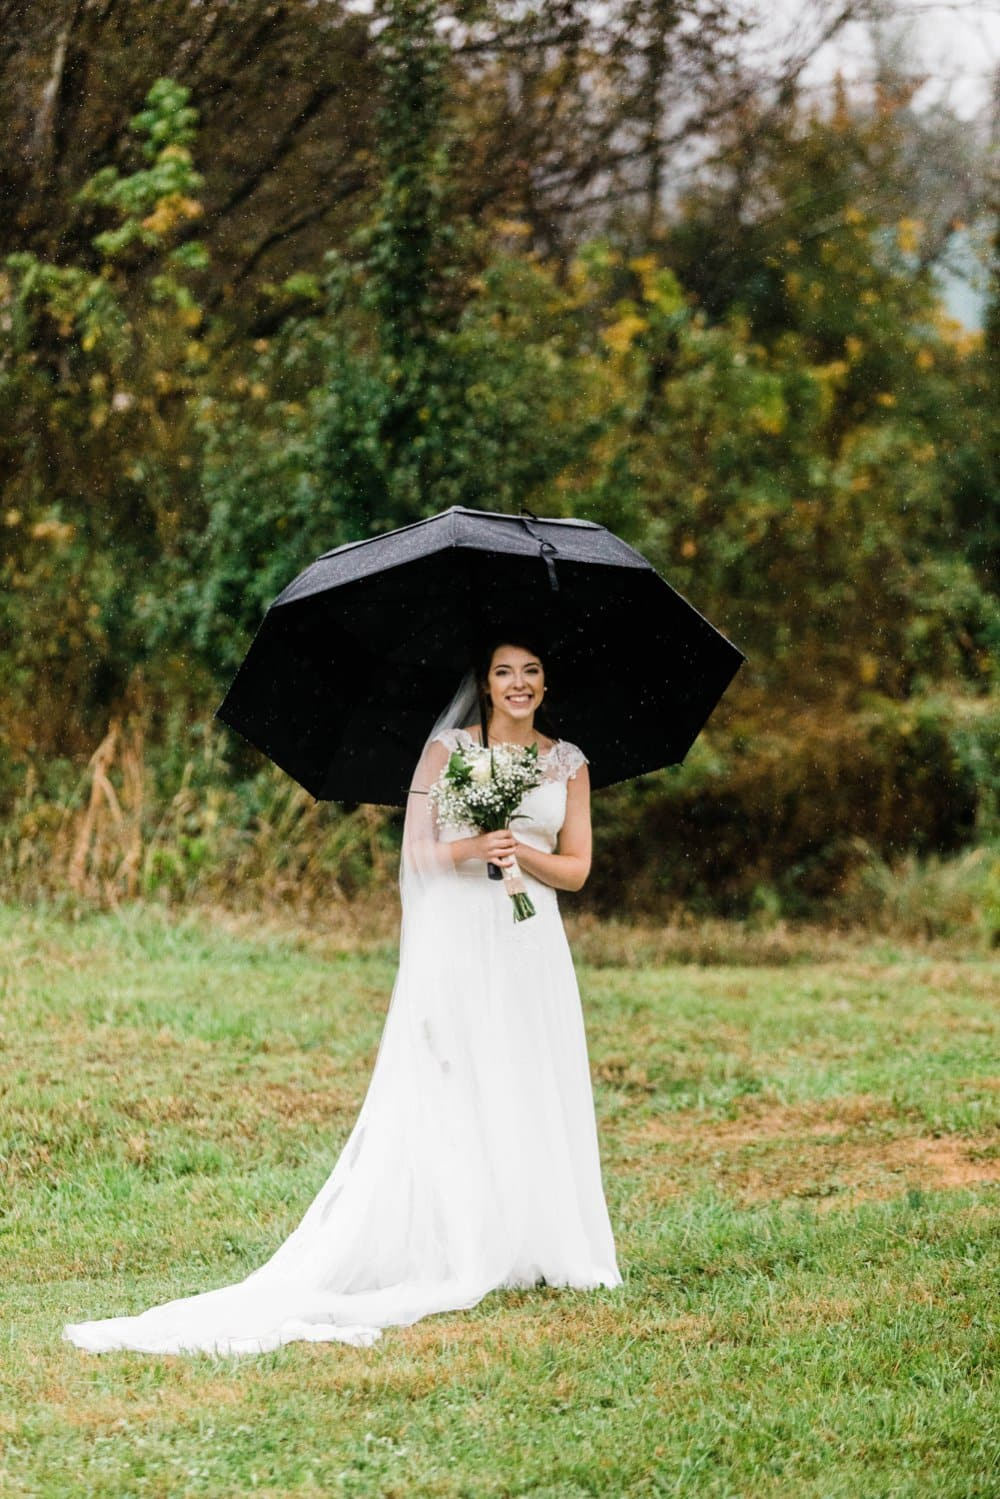 rainy day bride photo